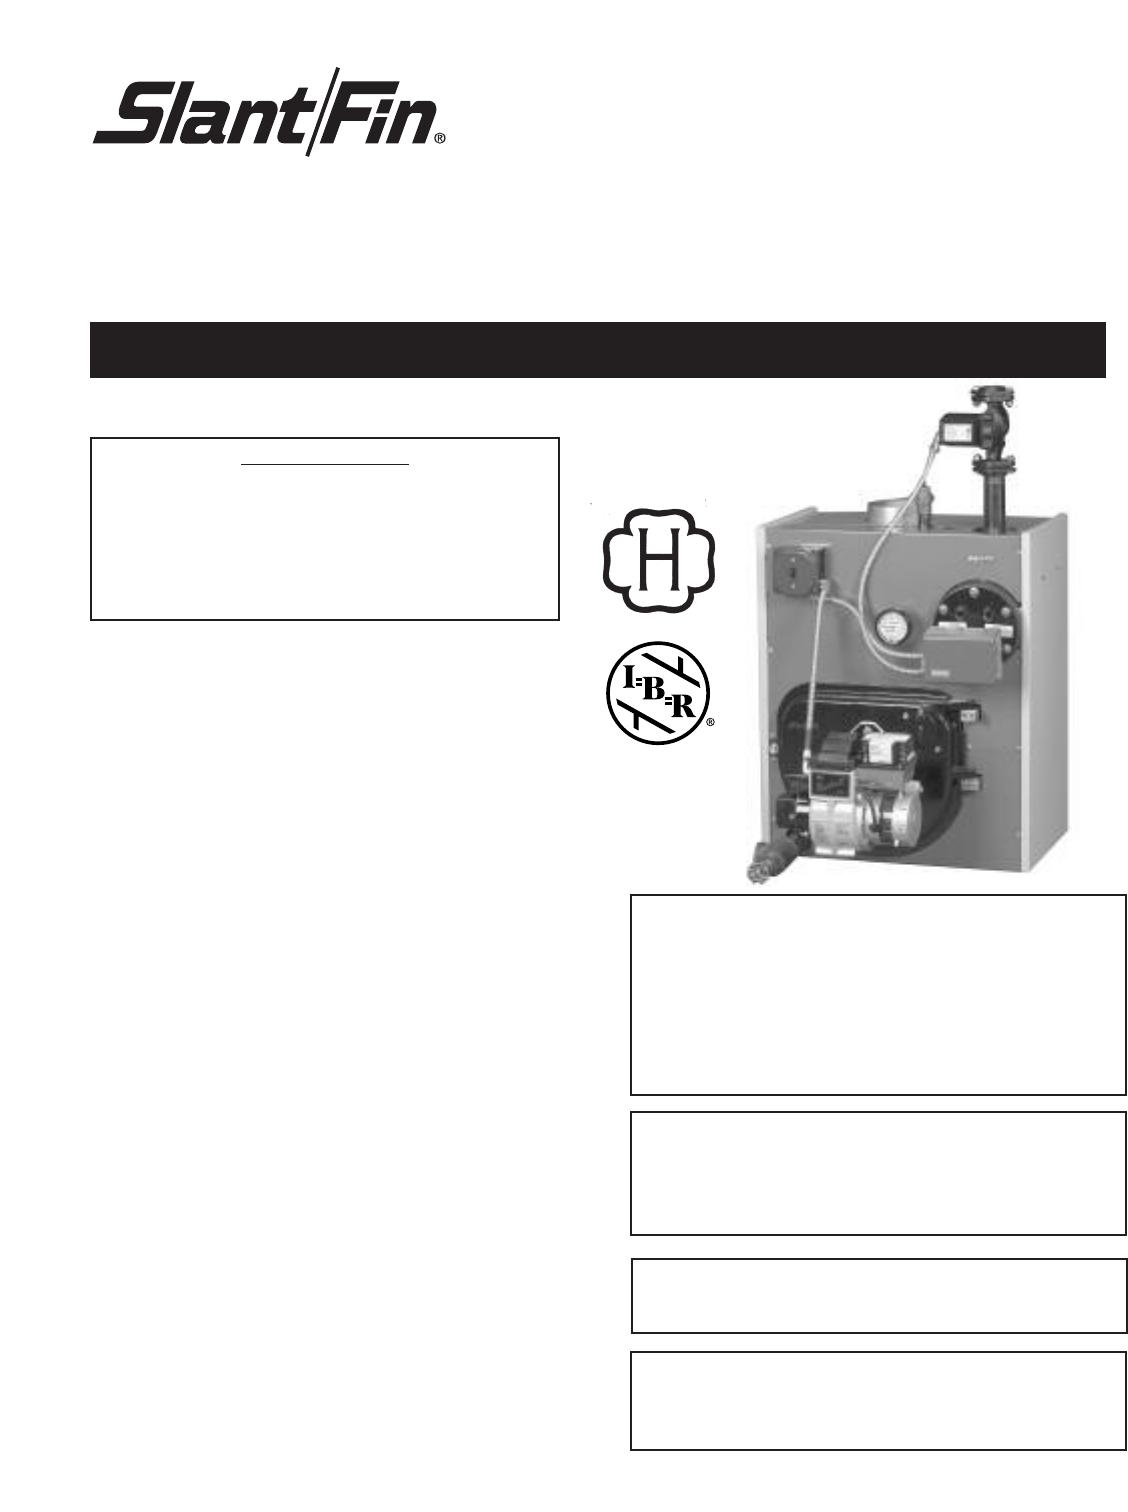 Slant Fin Intrepid Oil Fired Boiler Users Manual Ld 40 Wiring Diagram